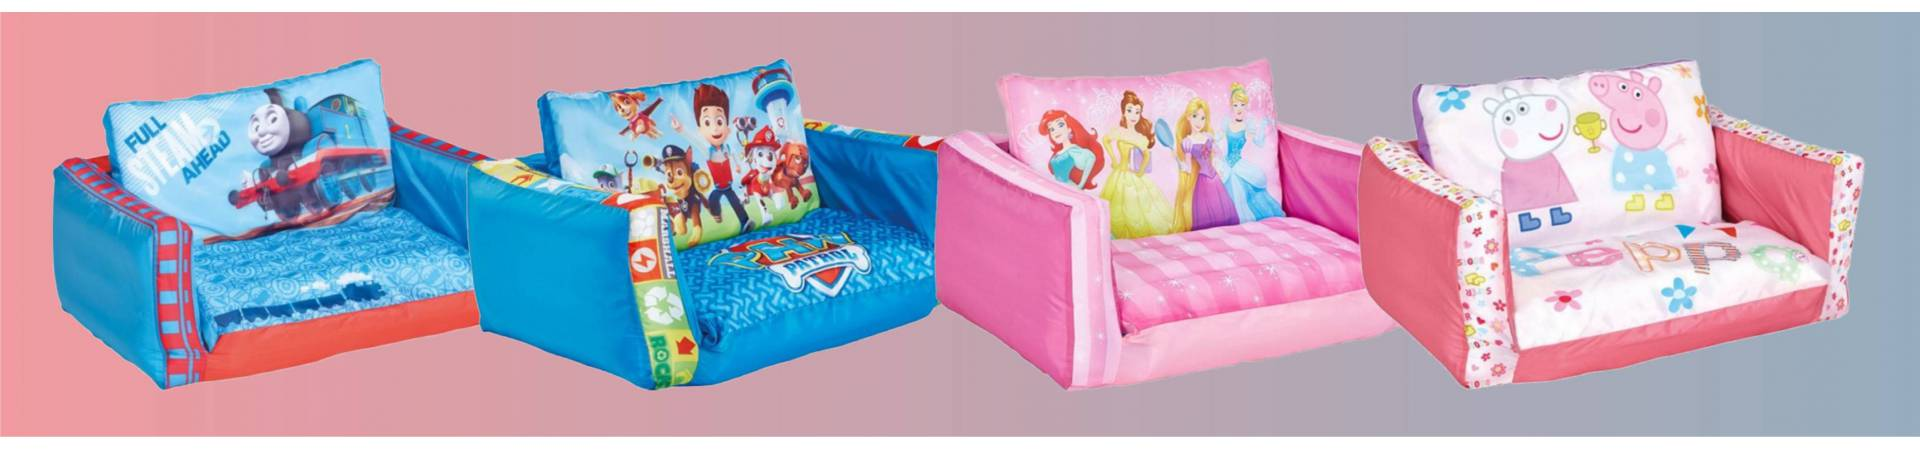 Disney felfújható kanapé